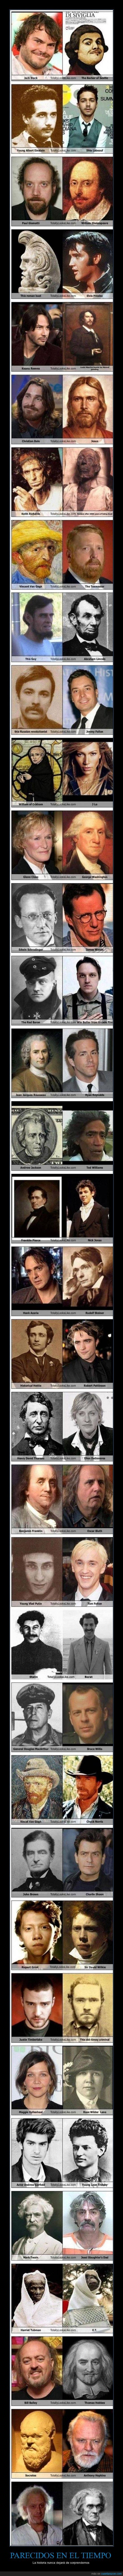 aristoteles,chuck,doc,emett,et,famosos,historia,jack,parecidos,ron